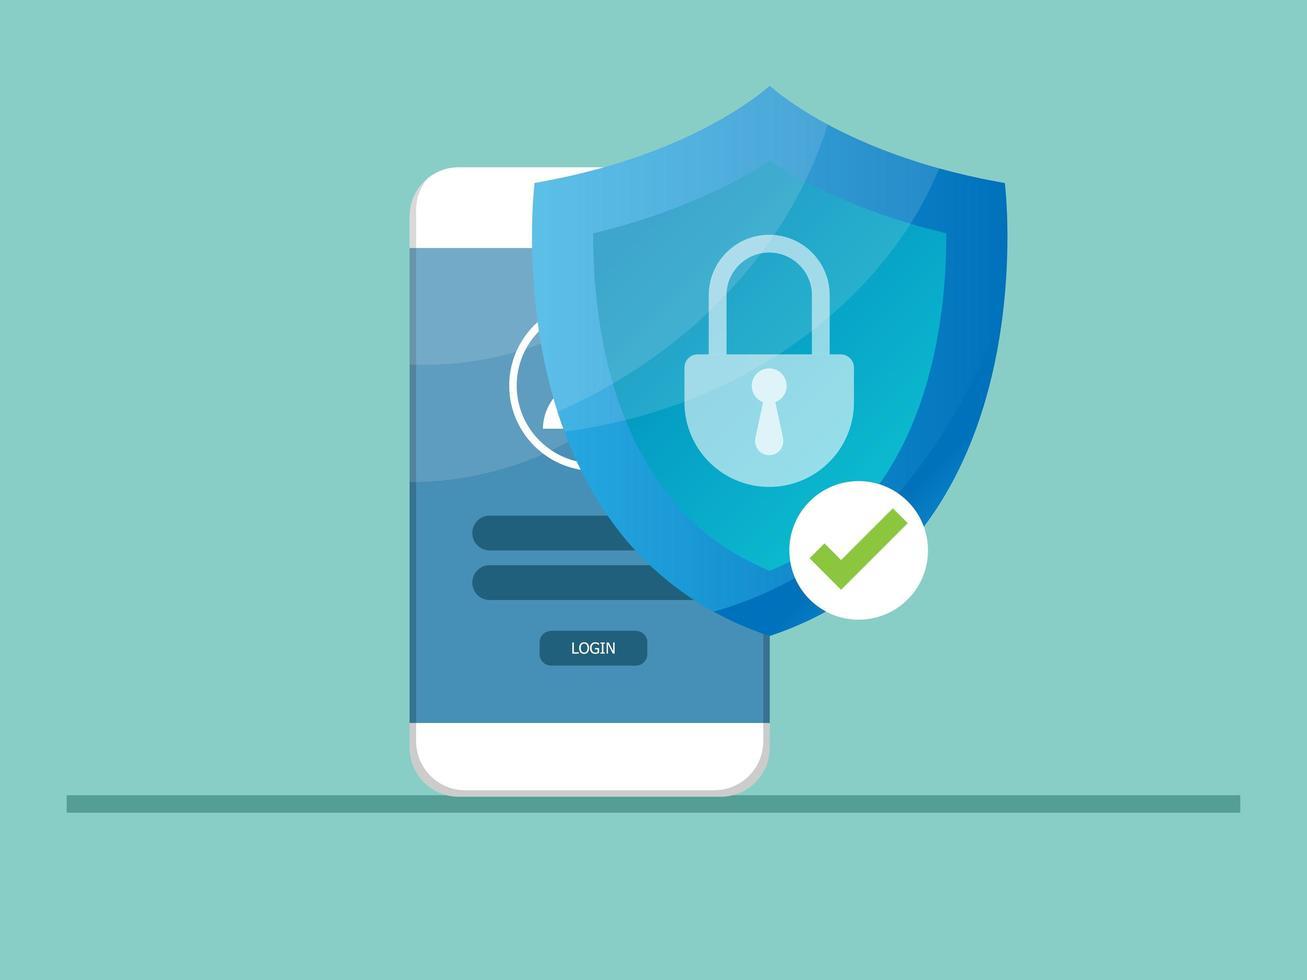 móvil bloqueado con protector de escudo, concepto de seguridad cibernética vector